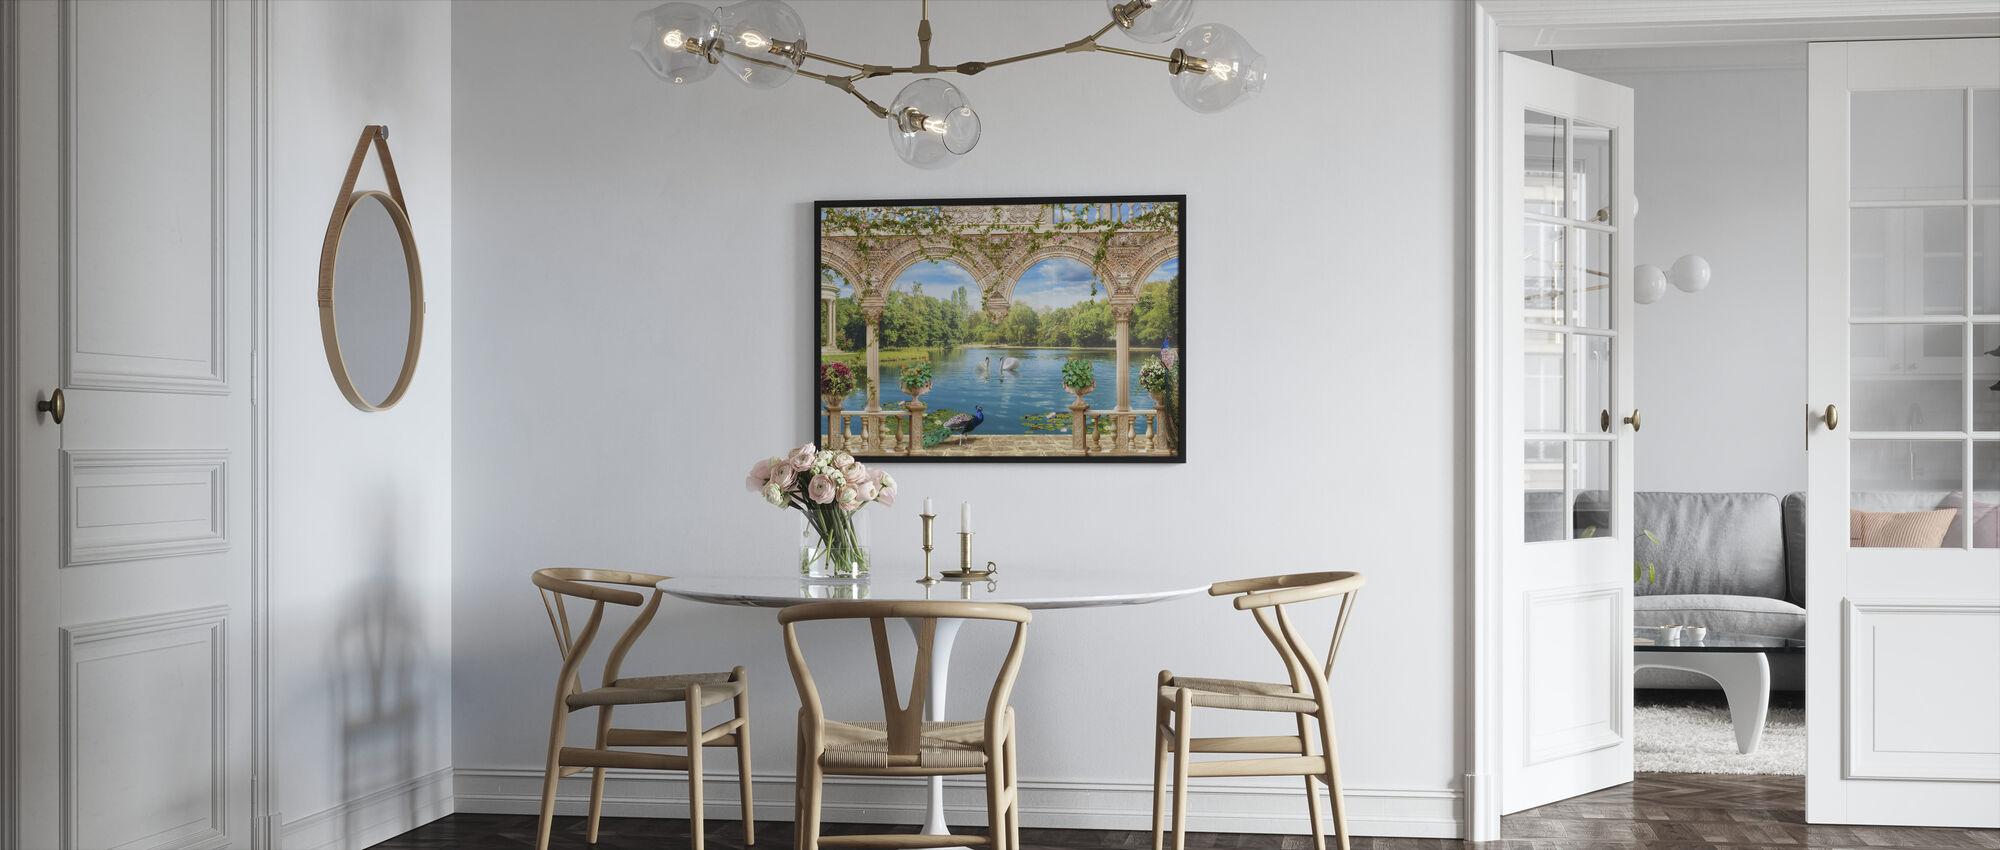 Swans in Park - Framed print - Kitchen